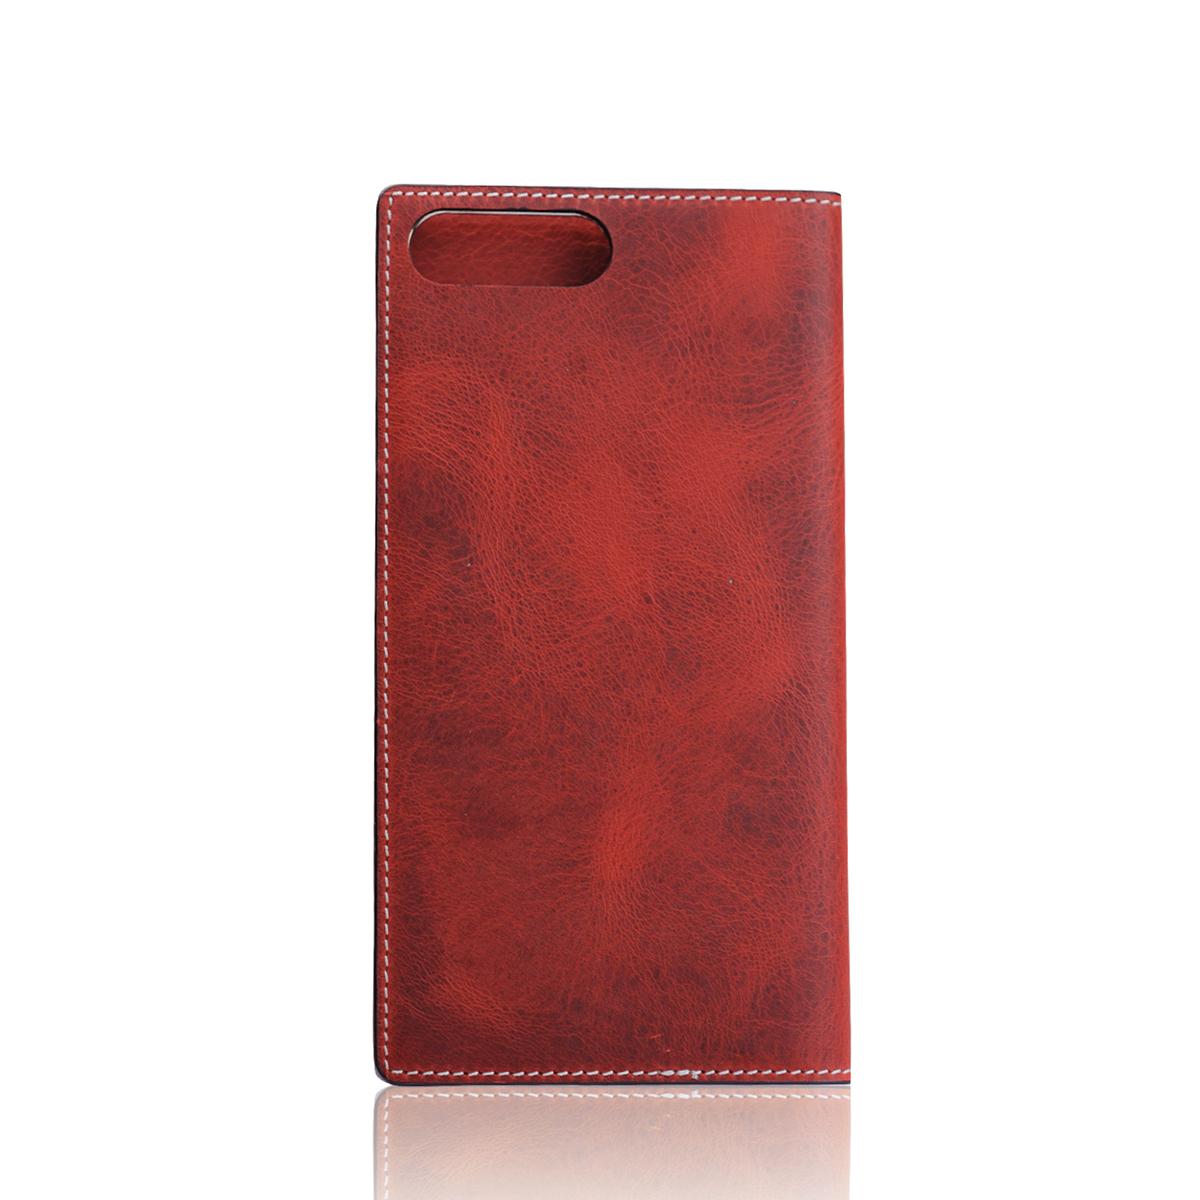 iPhone 8 Plus / 7 Plus ケース 手帳型 SLG Design Badalassi Wax case (エスエルジーデザイン バダラッシーワックスケース)アイフォン 本革 カバー